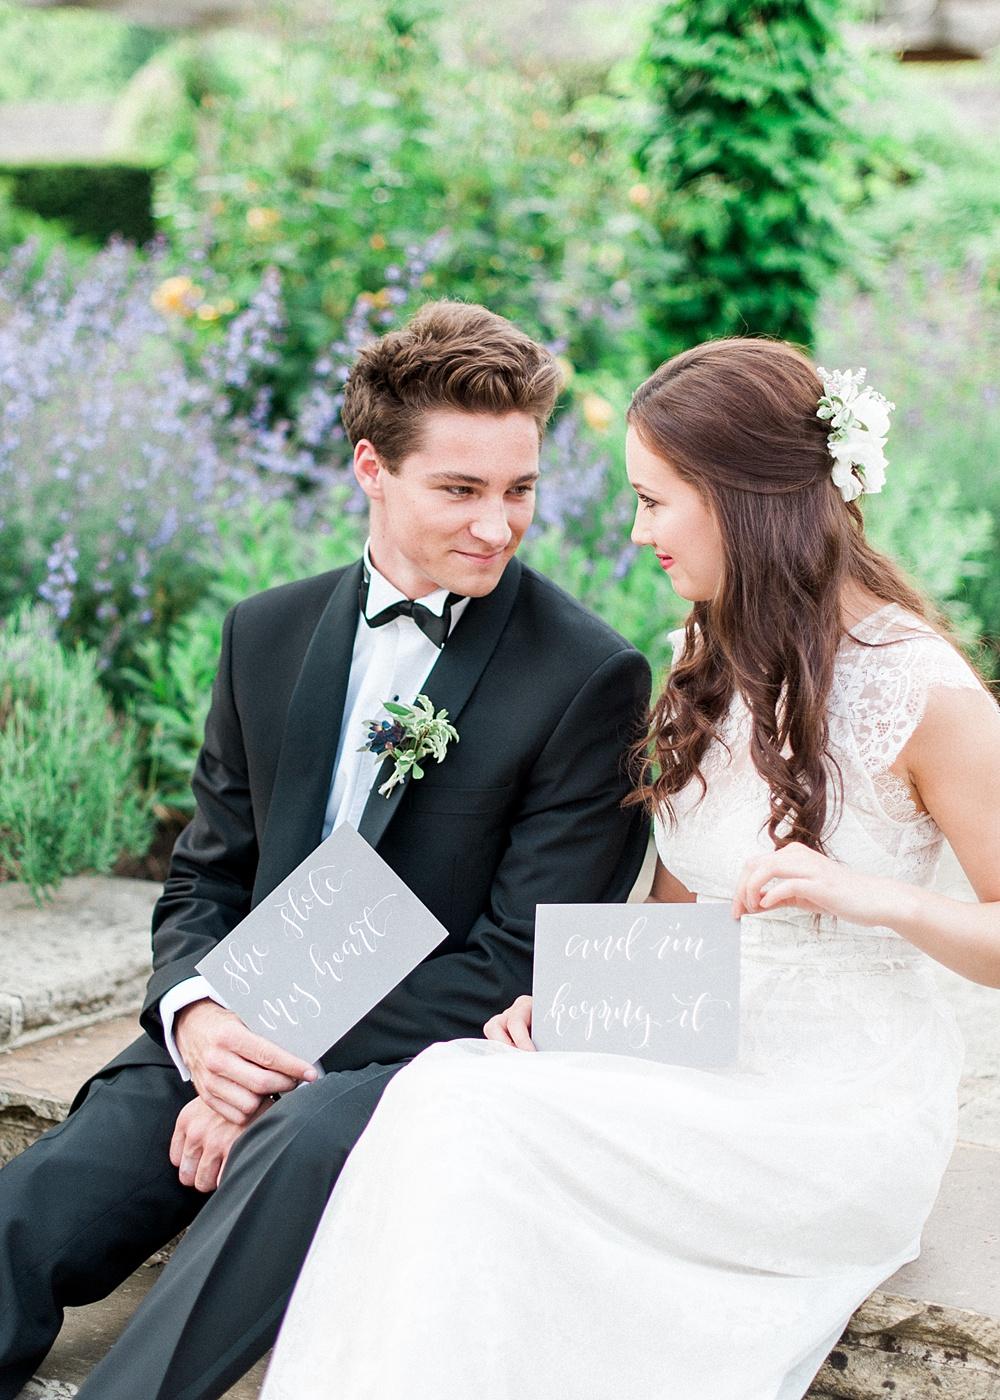 country wedding-charlotte munro wedding styling-wickham house-kate nielen_0075.jpg